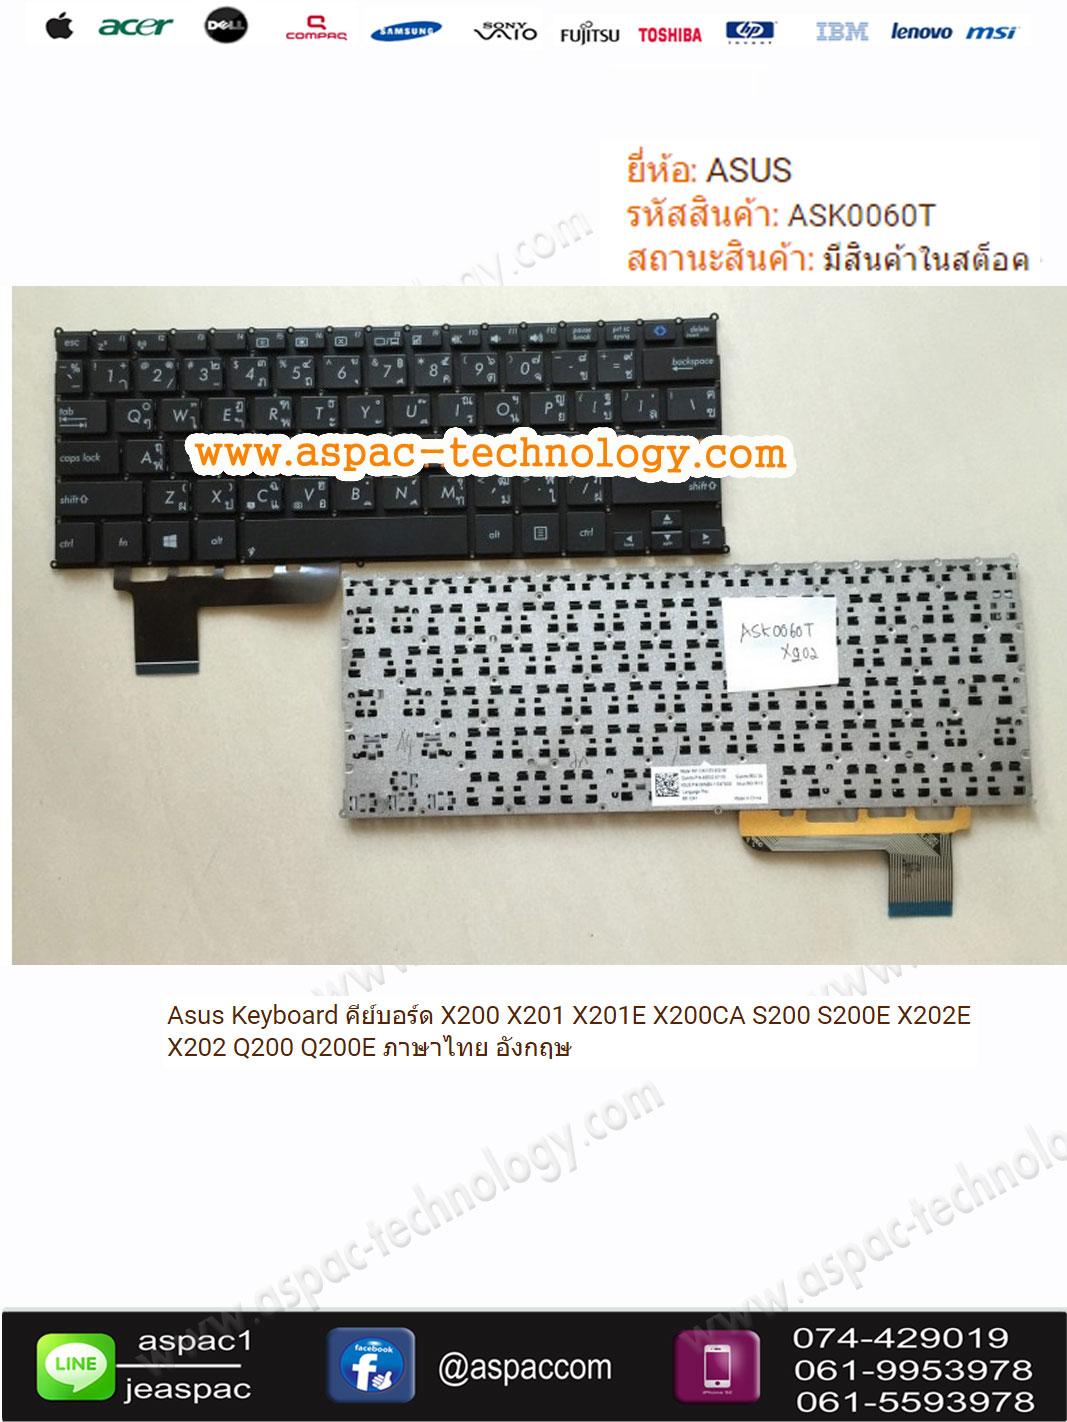 Asus Keyboard คีย์บอร์ด X200 X201 X201E X200CA S200 S200E X202E X202 Q200 Q200E ภาษาไทย อังกฤษ